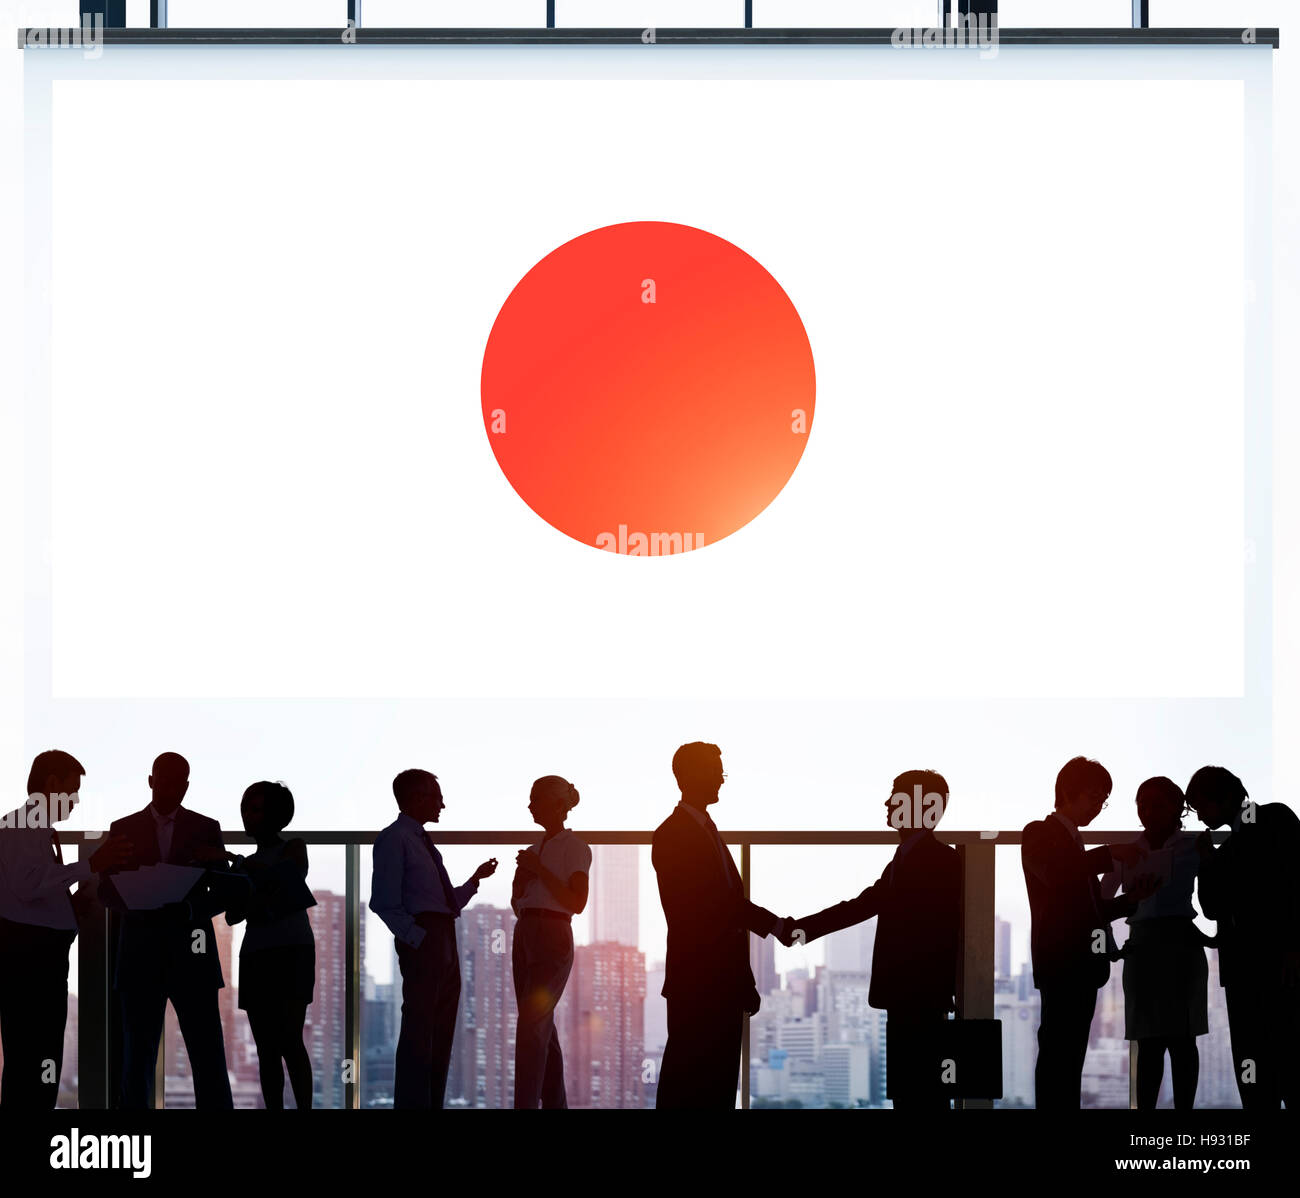 Japan Flag Patriotism Japanese Pride Unity Concept - Stock Image